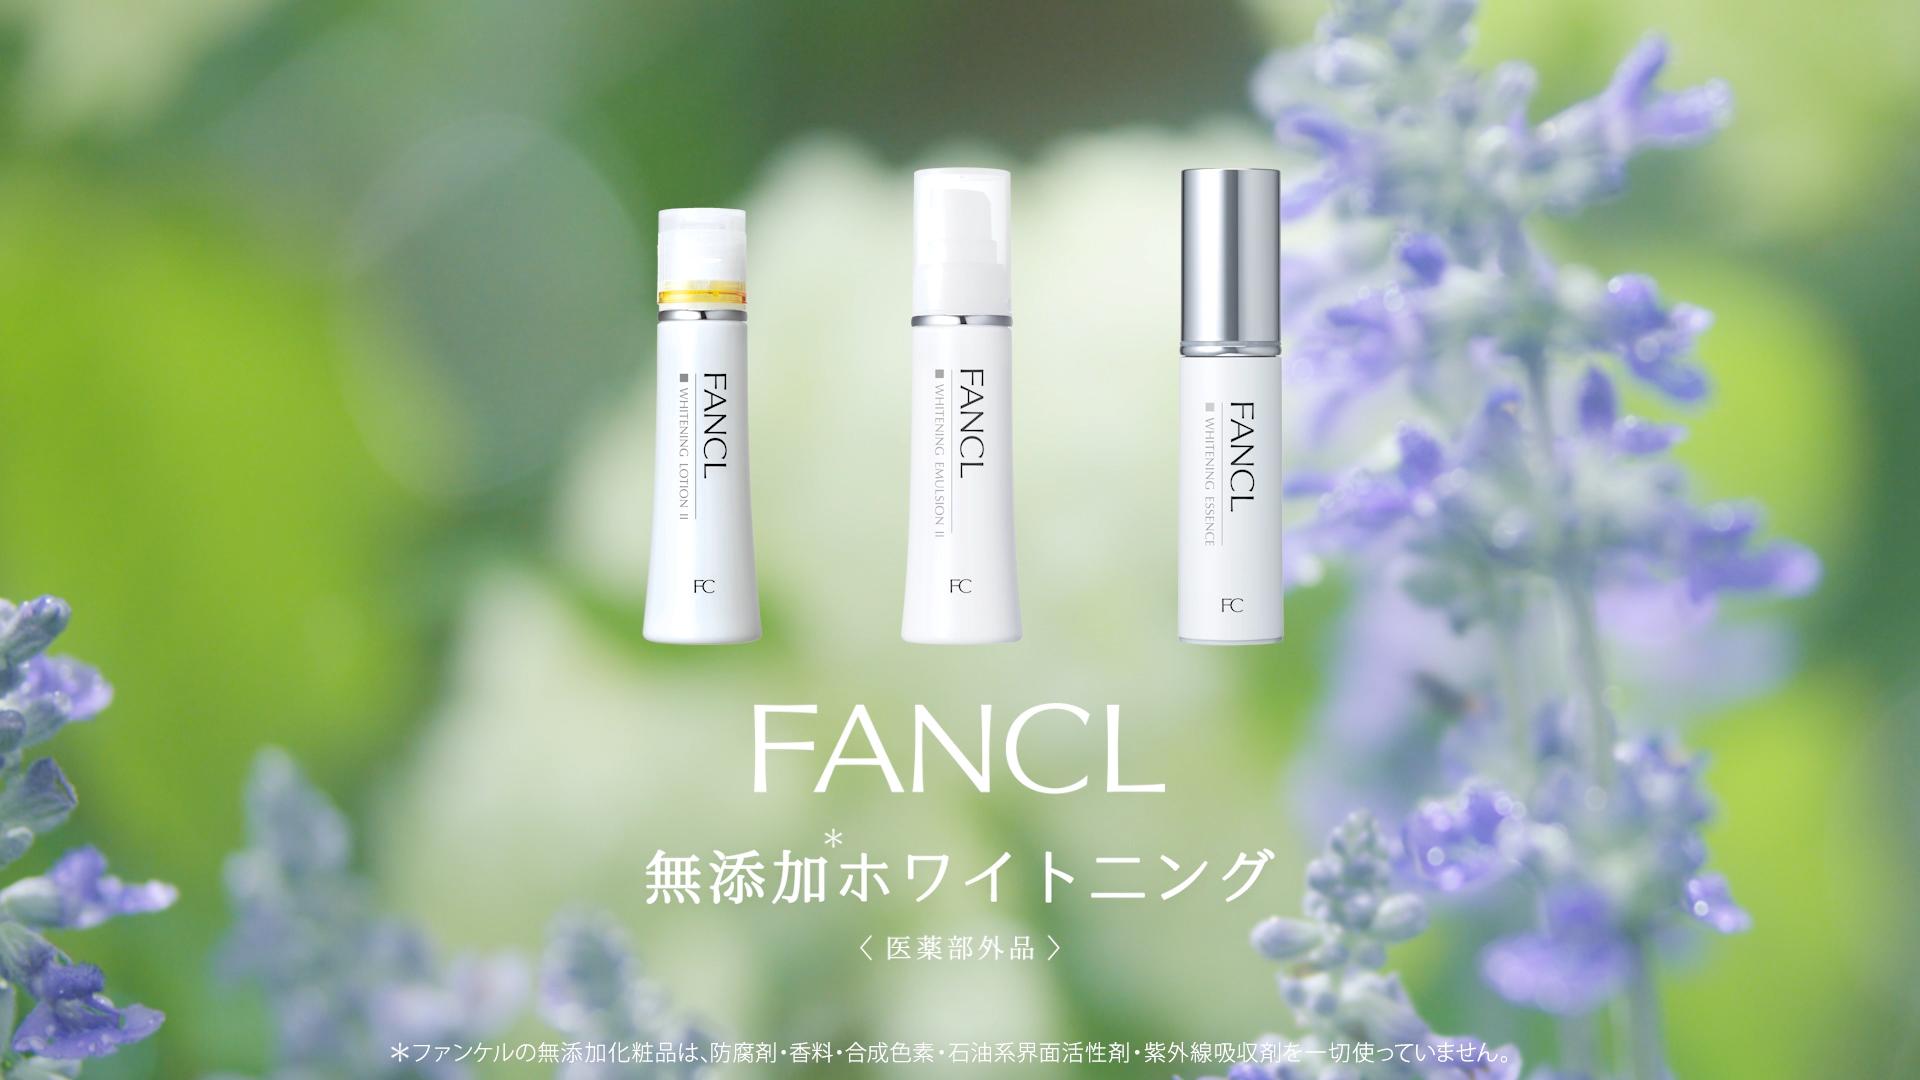 FANCL/無添加ホワイトニング WEBCM